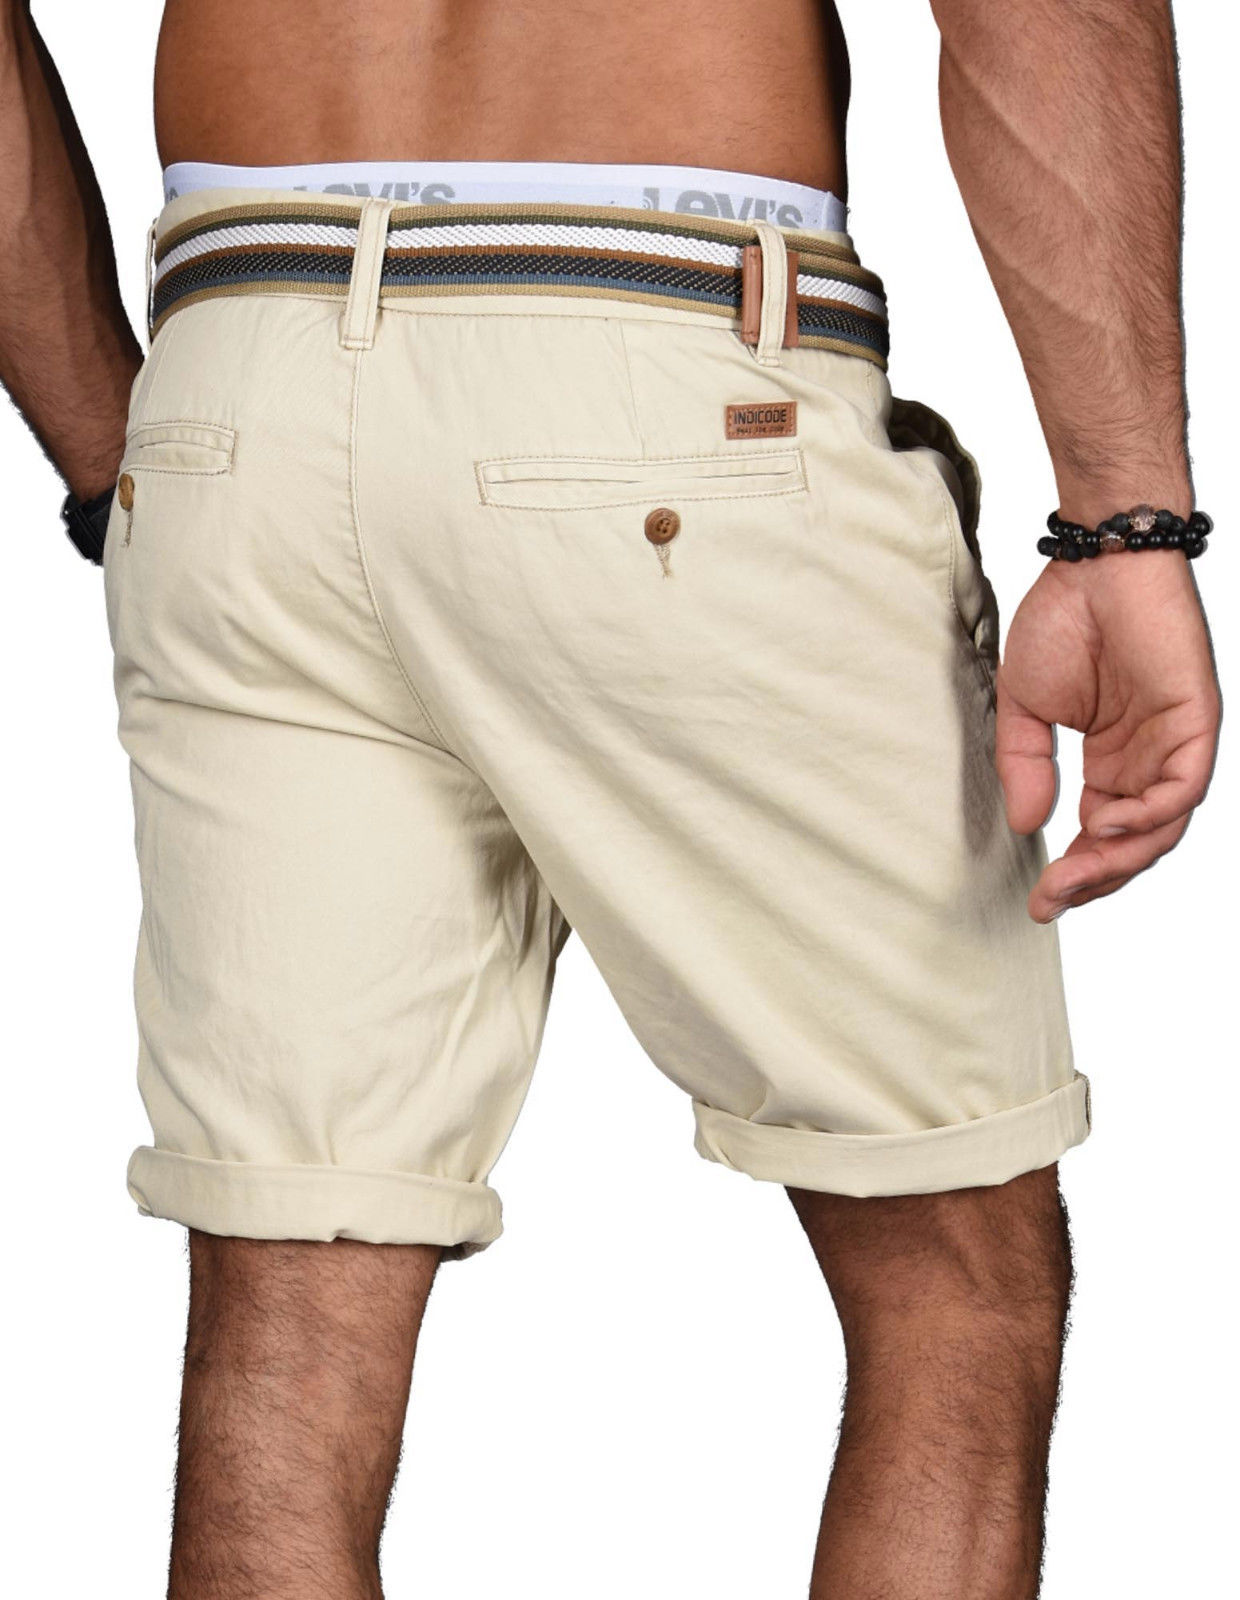 Indicode-Herren-Sommer-Bermuda-Chino-Shorts-kurze-Hose-Sommerhose-Short-NEU-B499 Indexbild 4